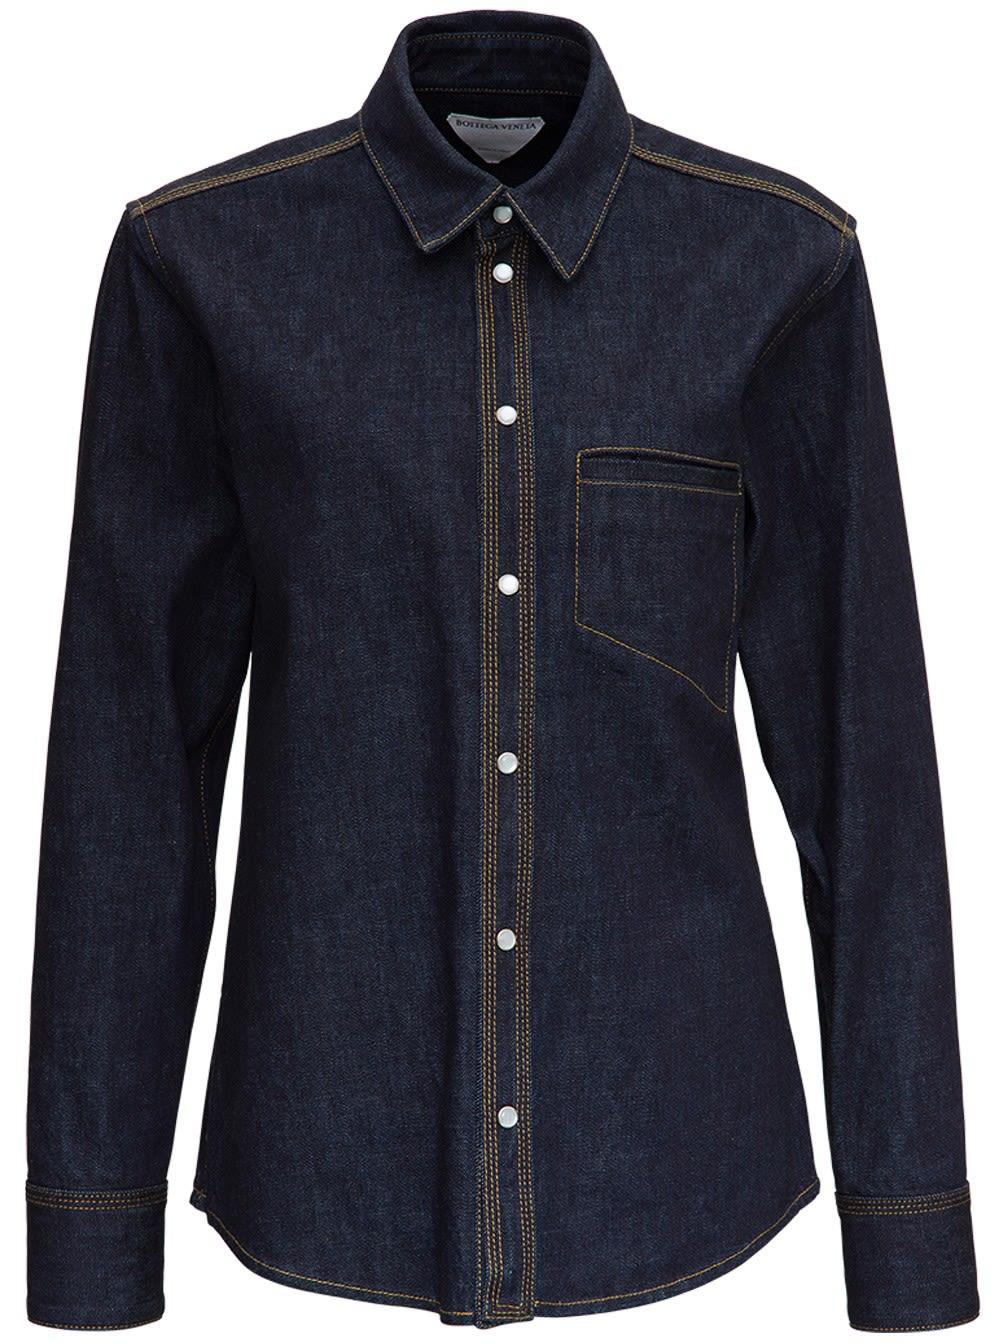 Bottega Veneta Denim Shirt With Contrasting Stitching